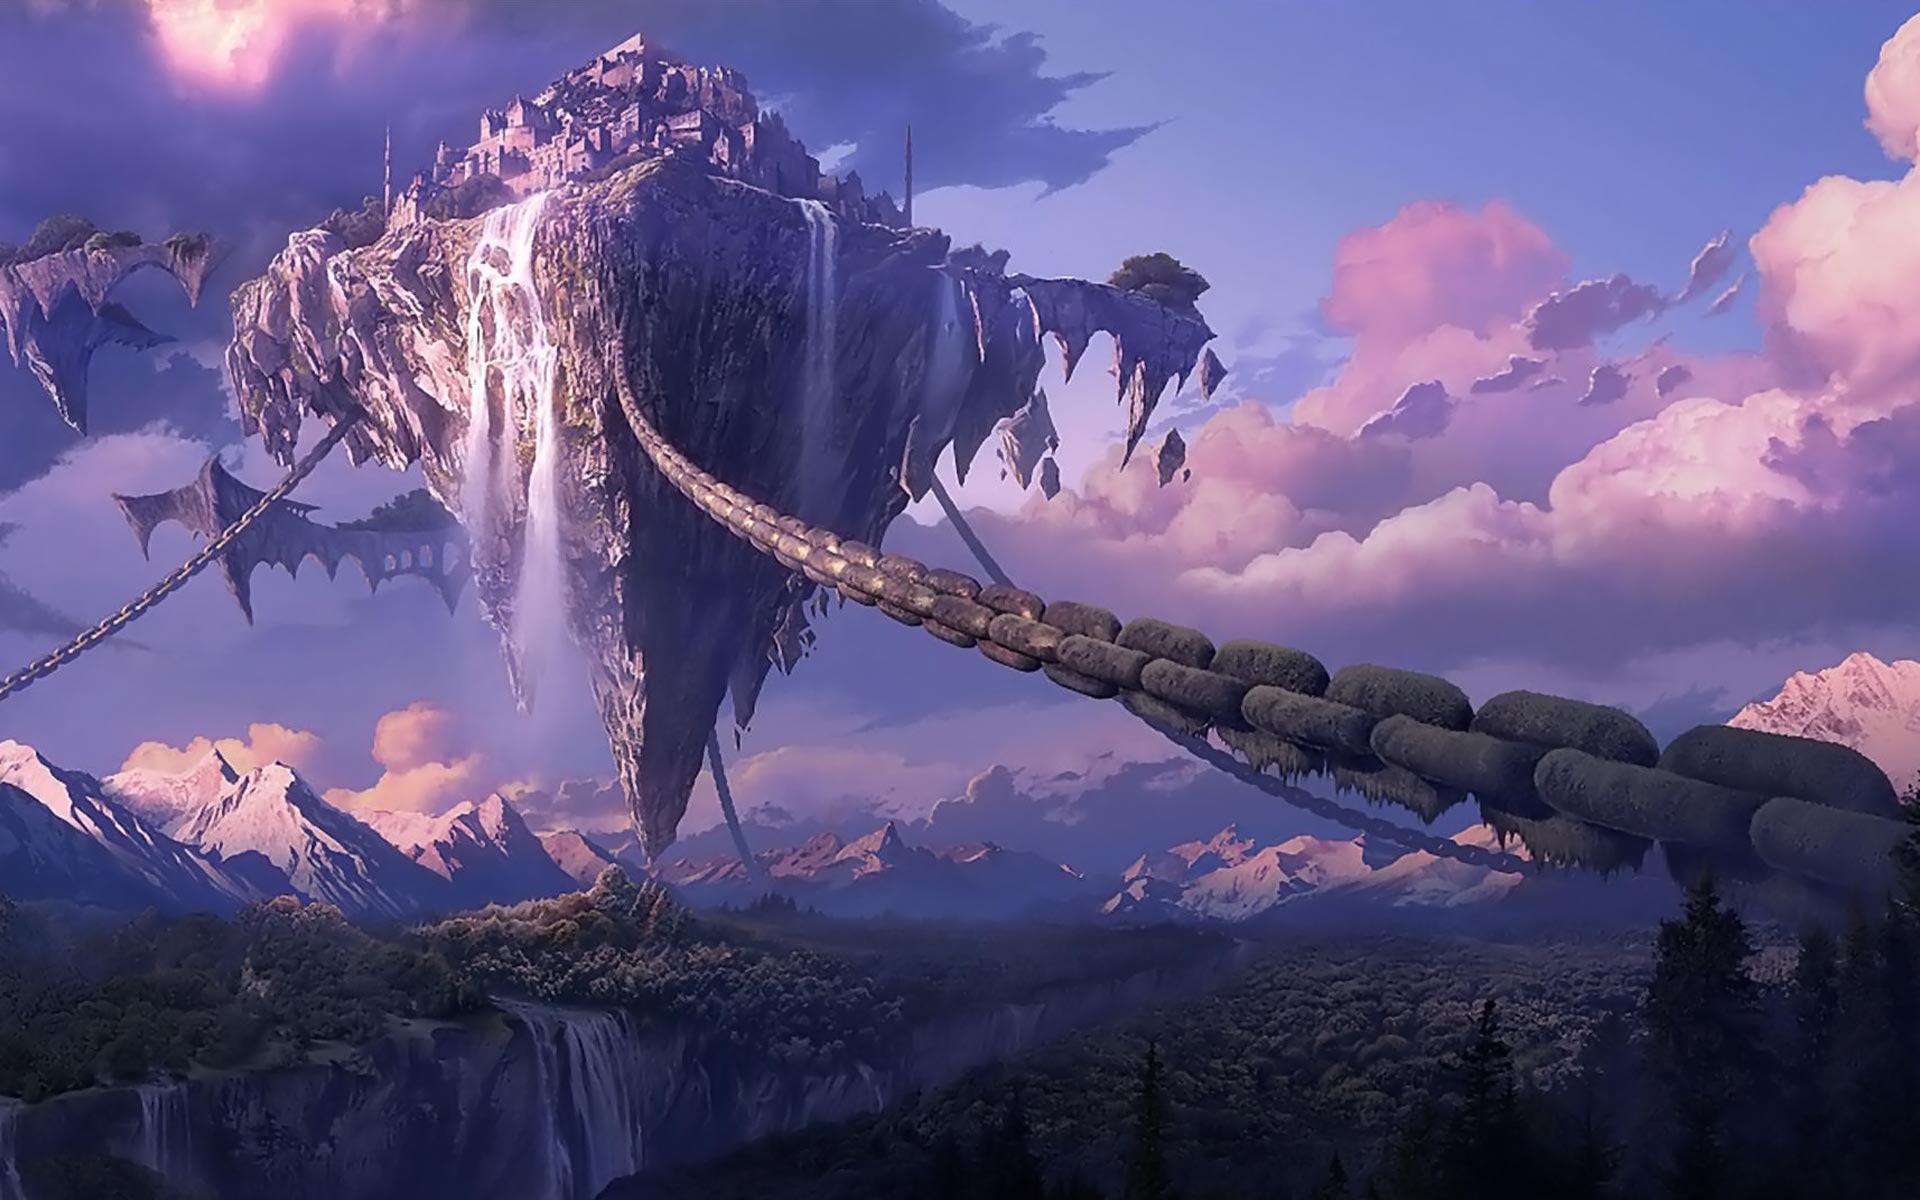 80 best D&D Inspiration images on Pinterest   Fantasy places, Fantasy  landscape and Landscapes